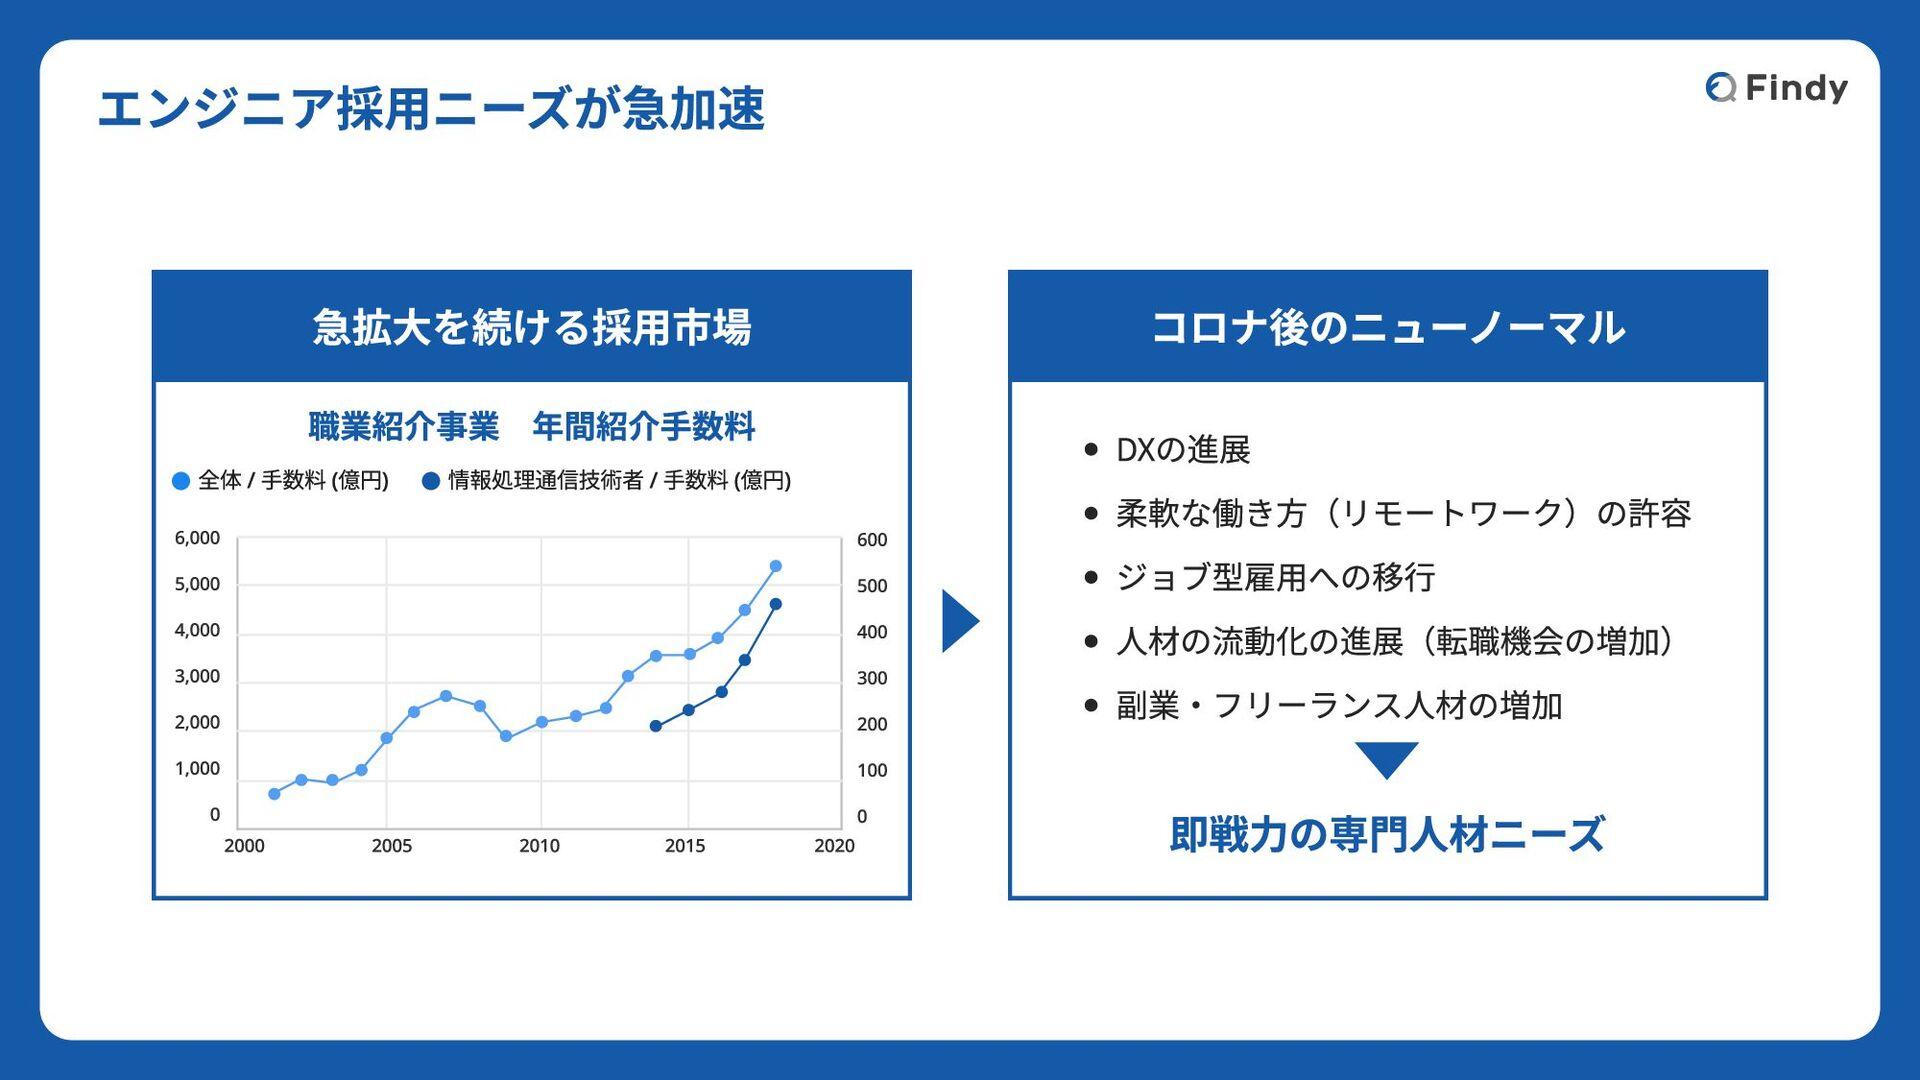 © 2020 Findy,Inc 採⽤情